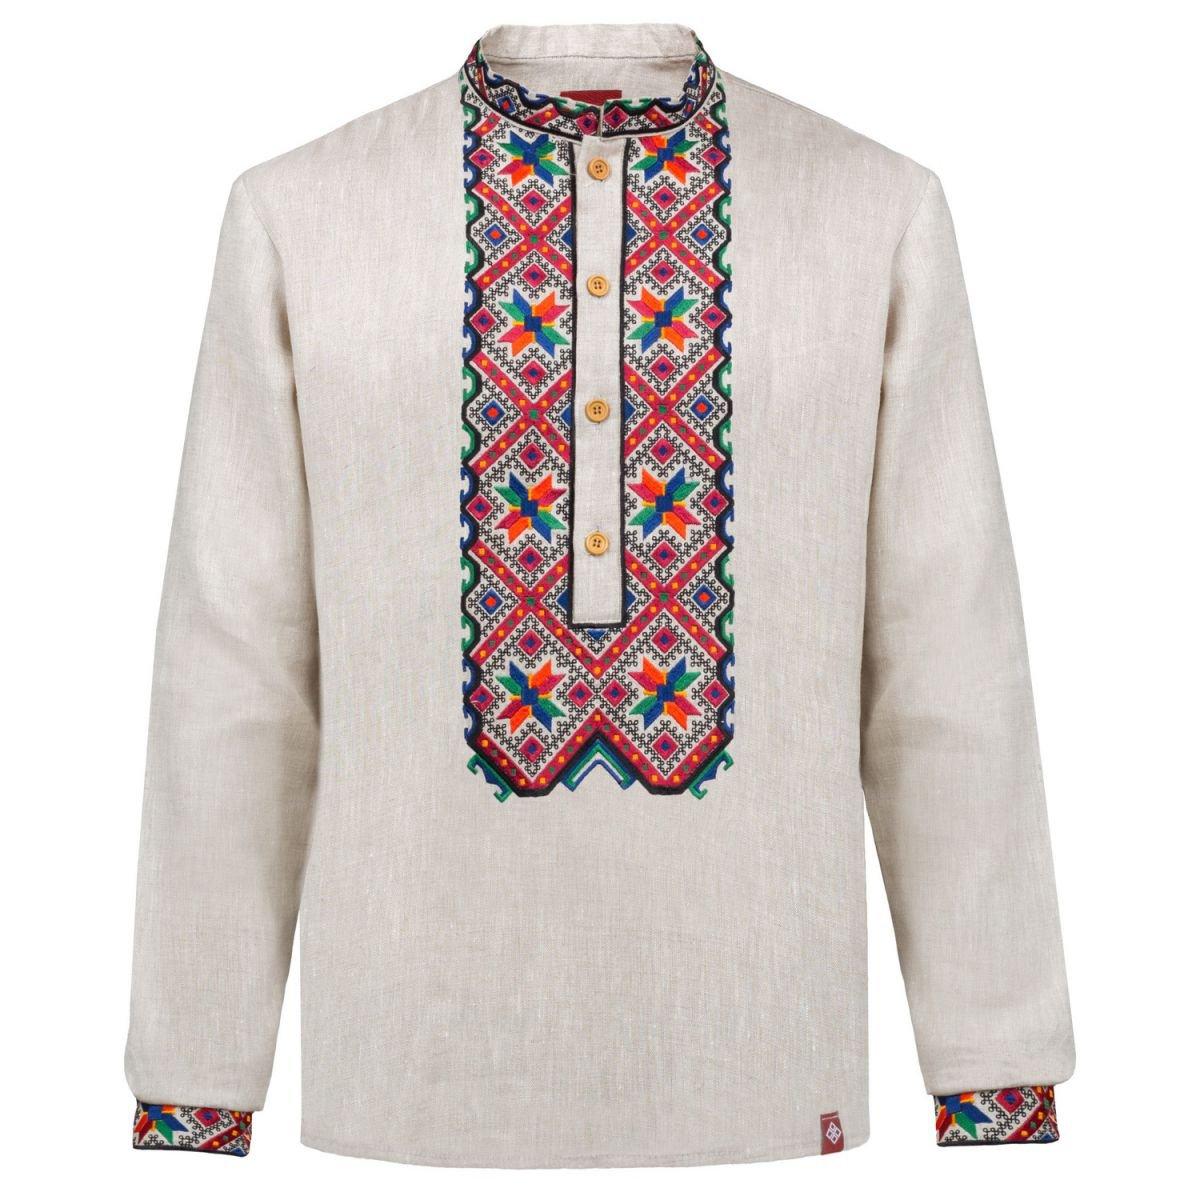 Сорочка чоловіча вишиванка Фолк мода (730) XXL 1c184aacea528